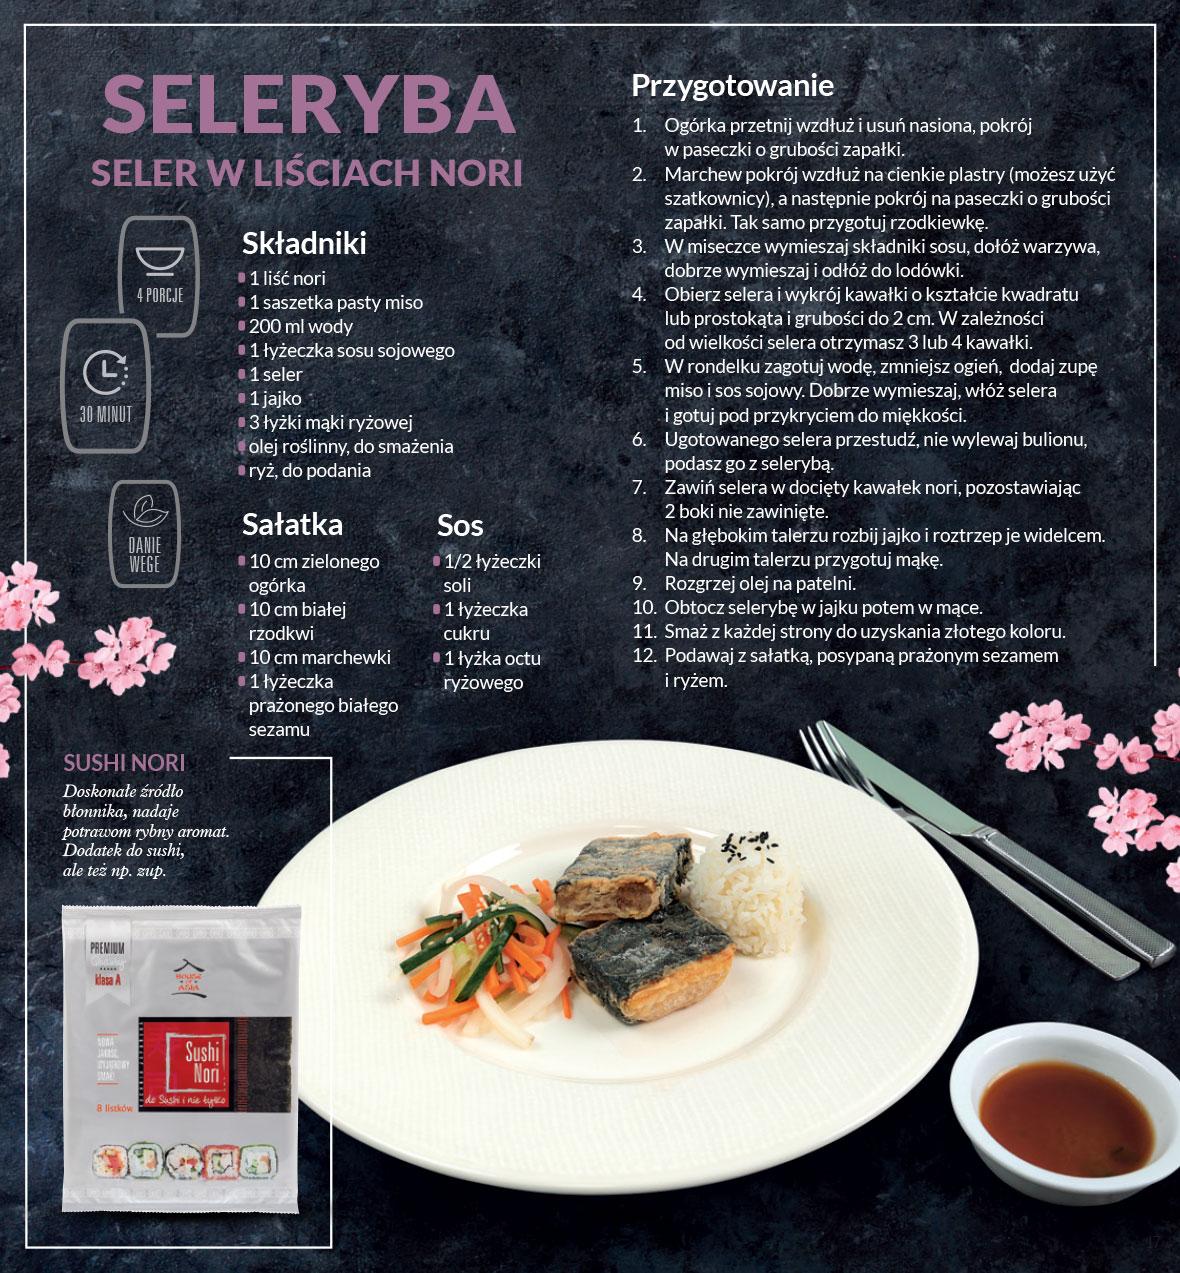 Seleryba - seler w liściach nori